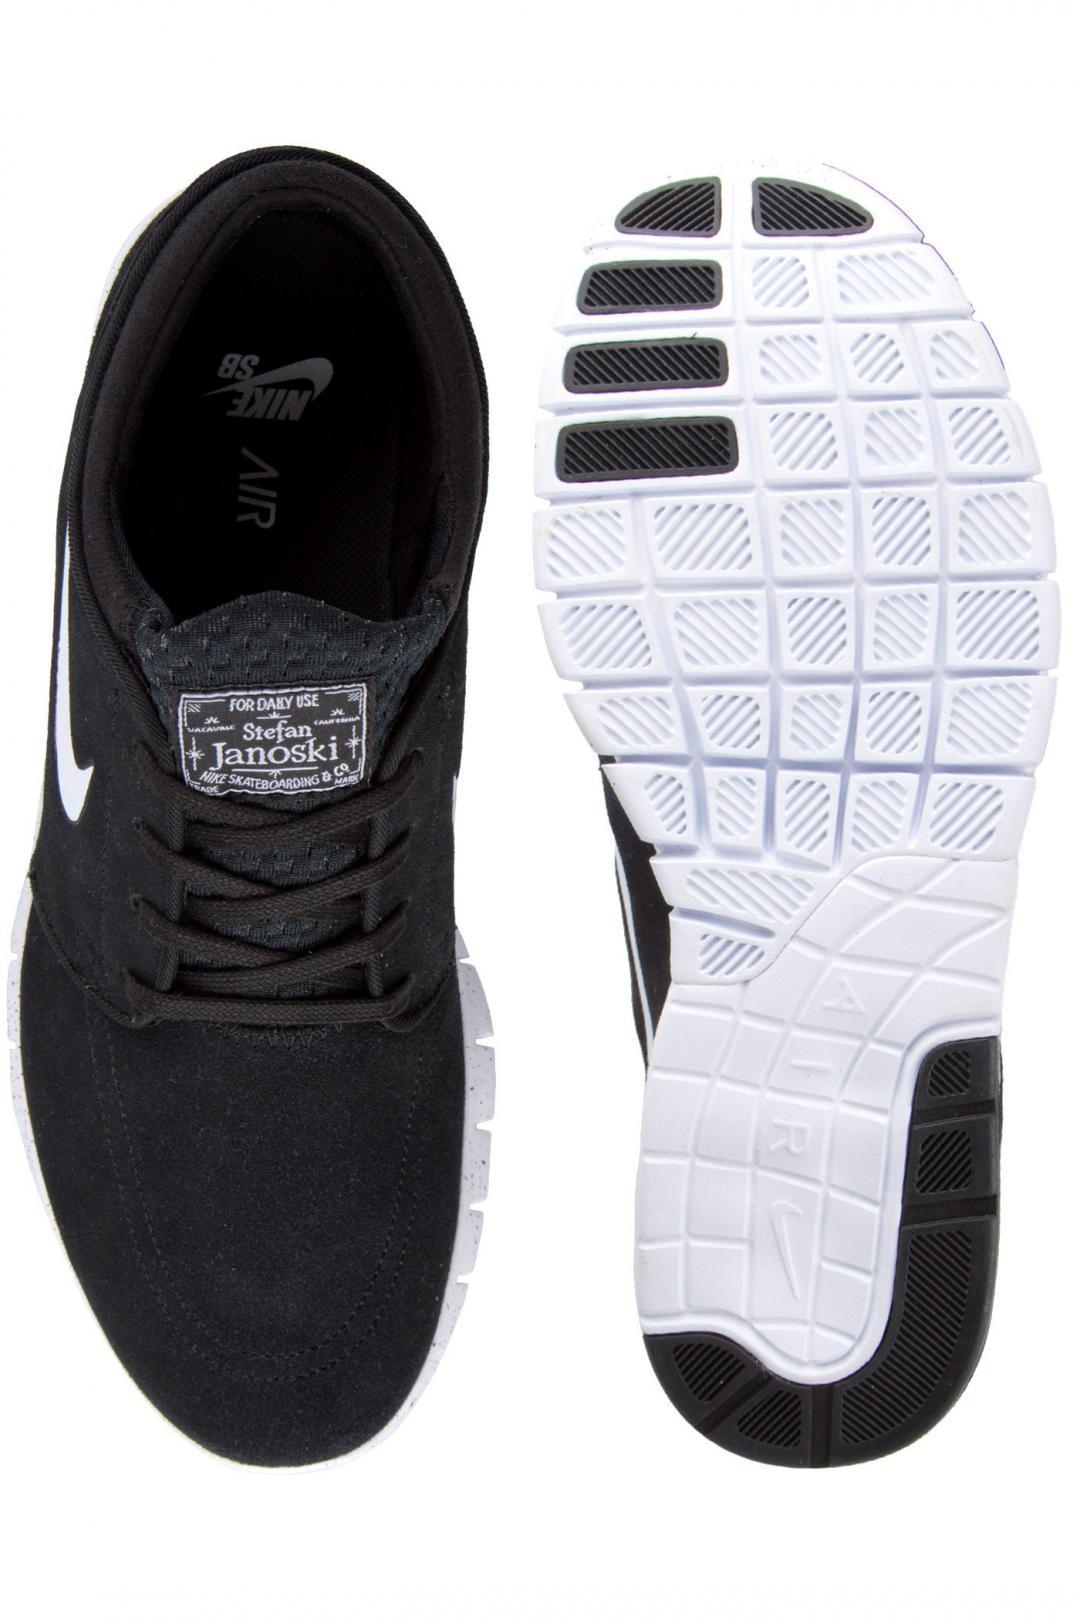 Uomo/Donna Nike SB Stefan Janoski Max Suede black white | Sneakers low top